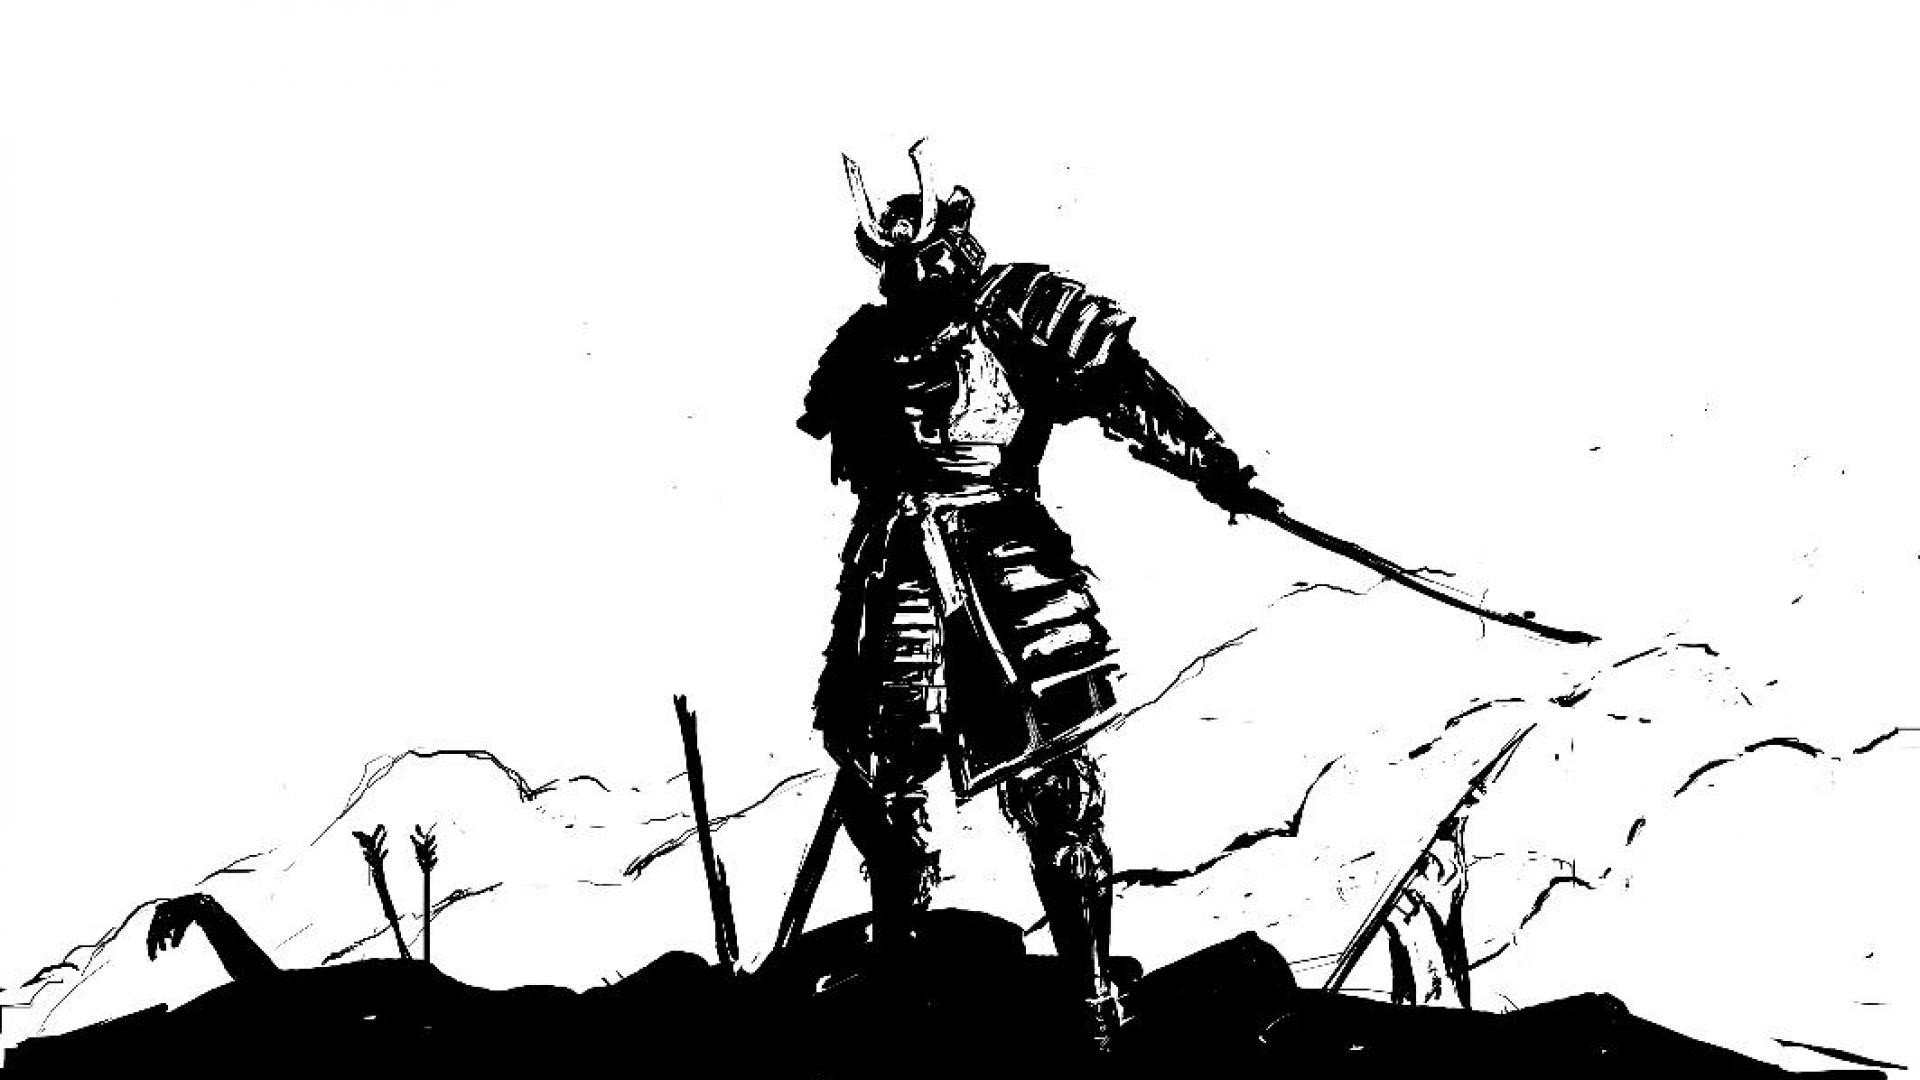 samurai-wallpaper-9.jpg, 133KiB, 1920×1080